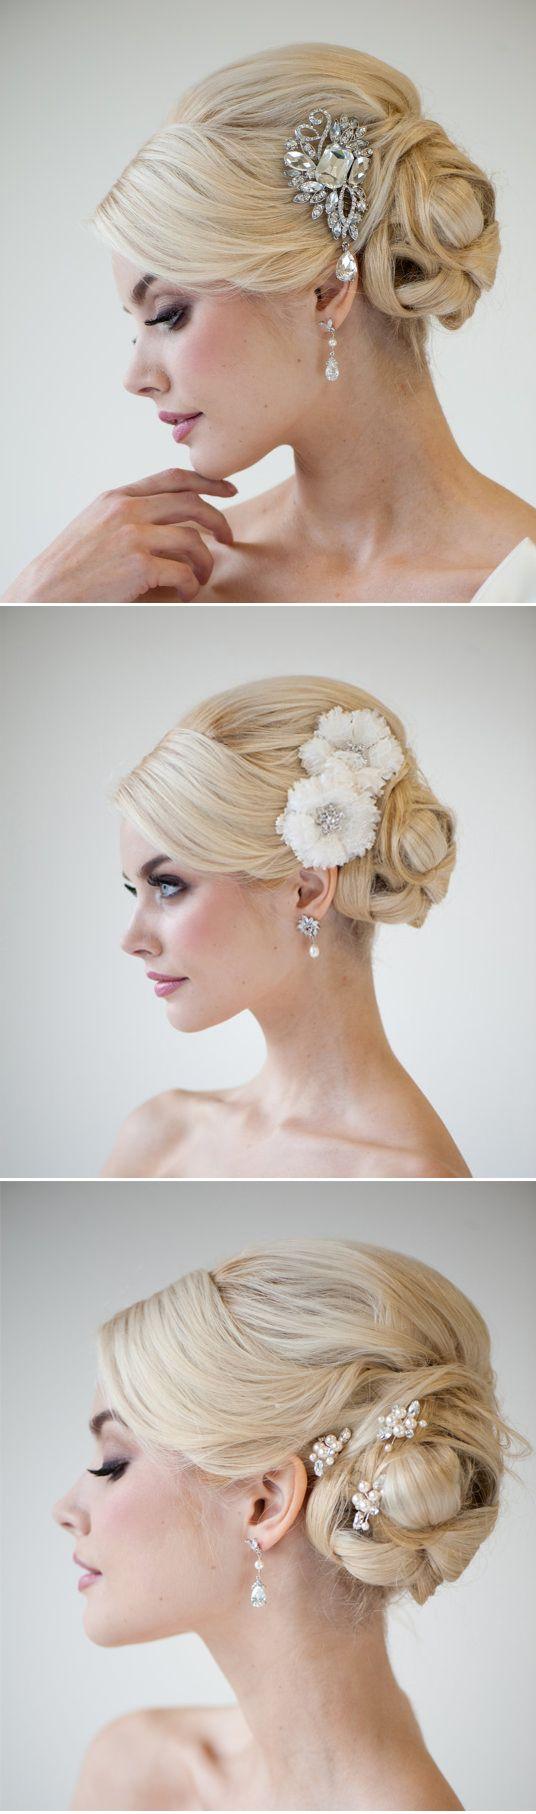 wedding up doHair Ideas, Hair Piece, Wedding Hair, Bridesmaid Hair, Wedding Updo, Bridal Hairstyles, Hair Style, Bridal Hair Accessories, Bridal Accessories